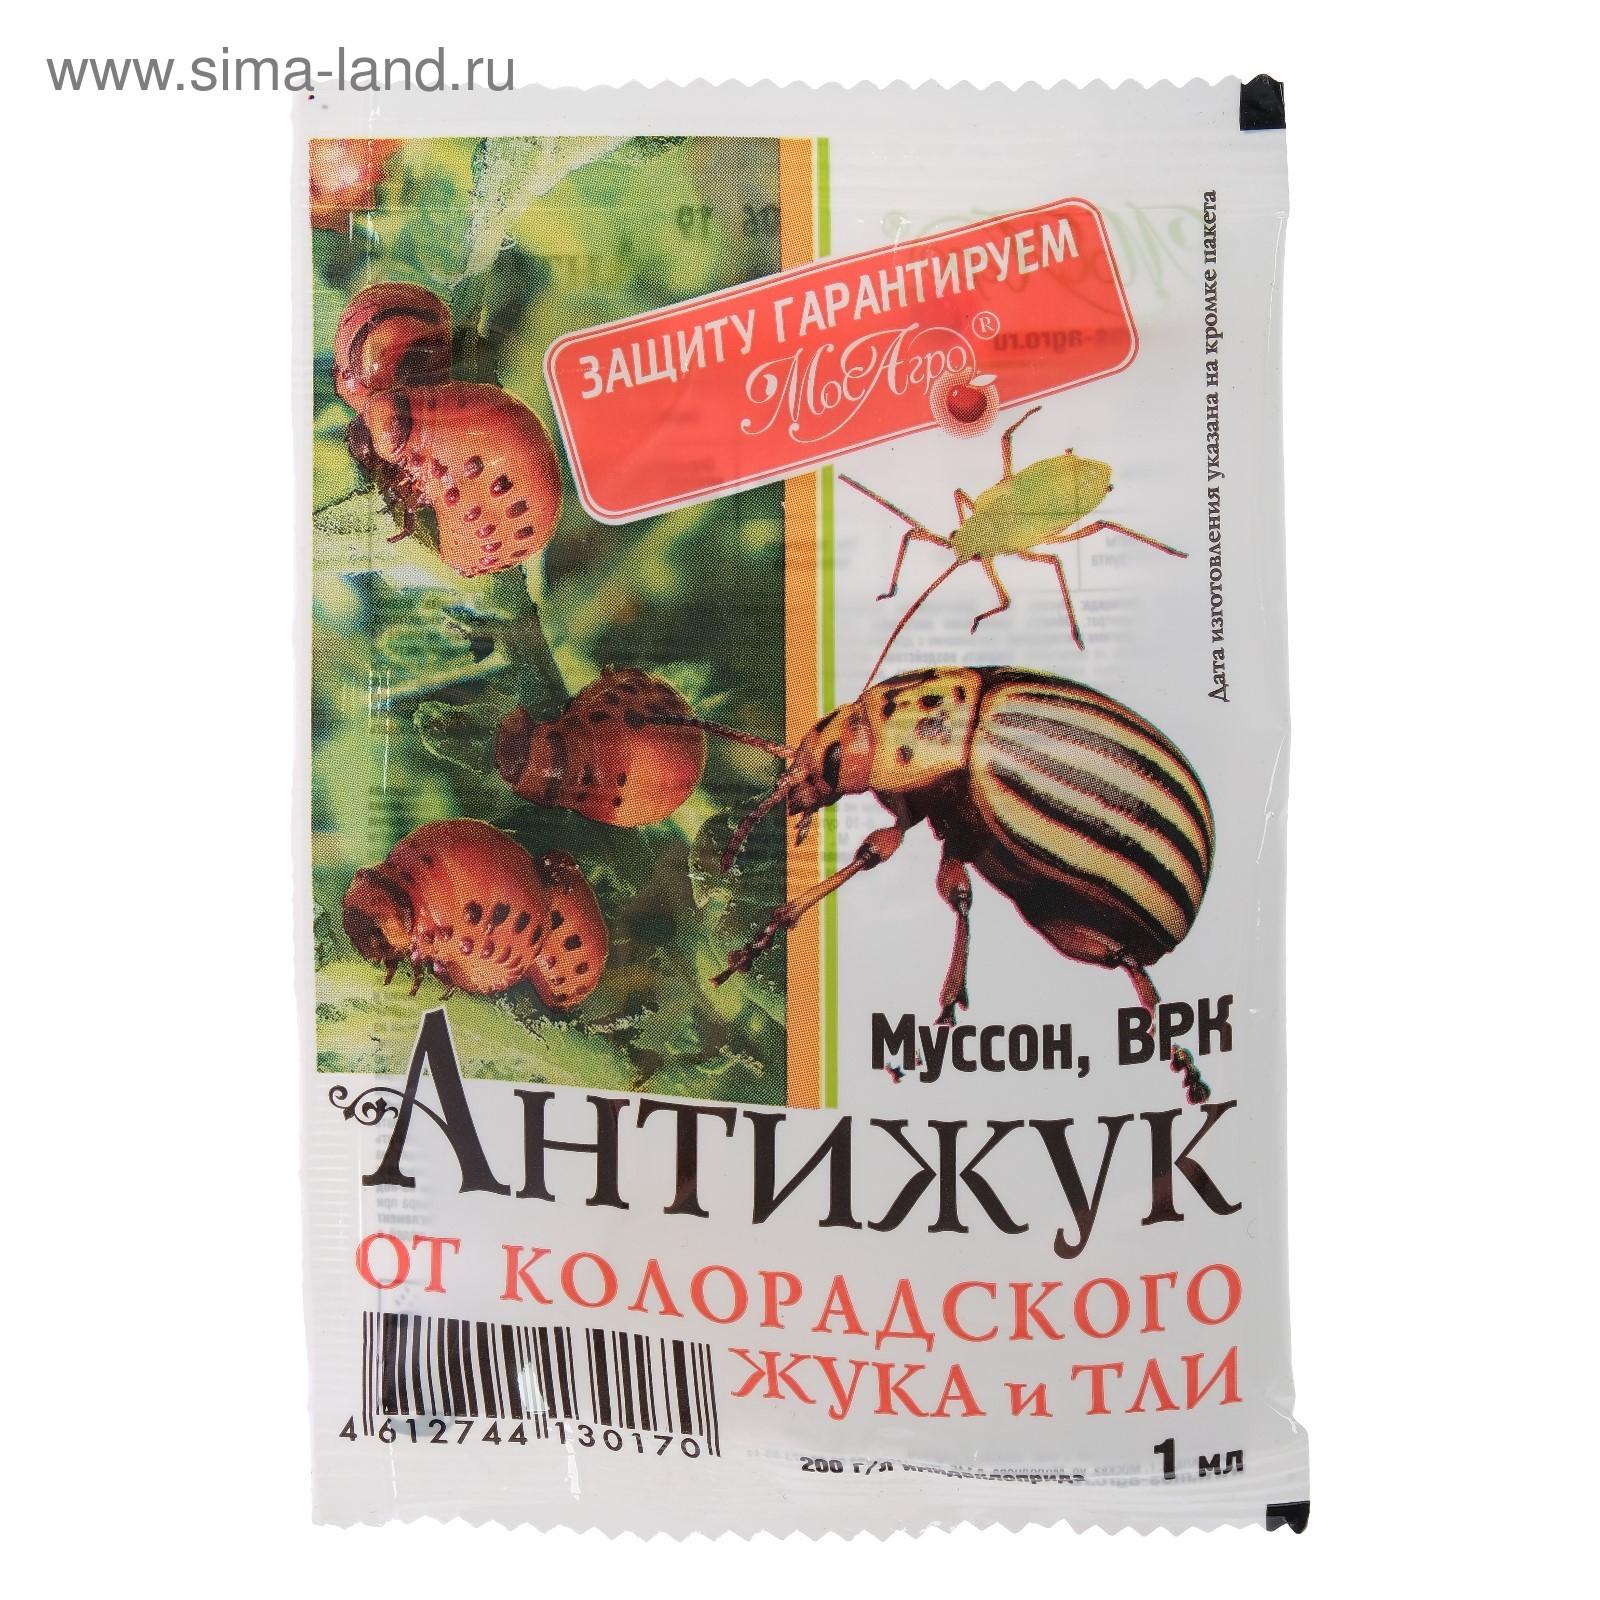 МОСАГРО МУССОН средство для защиты от колорадского жука ампула 1 мл в пакете